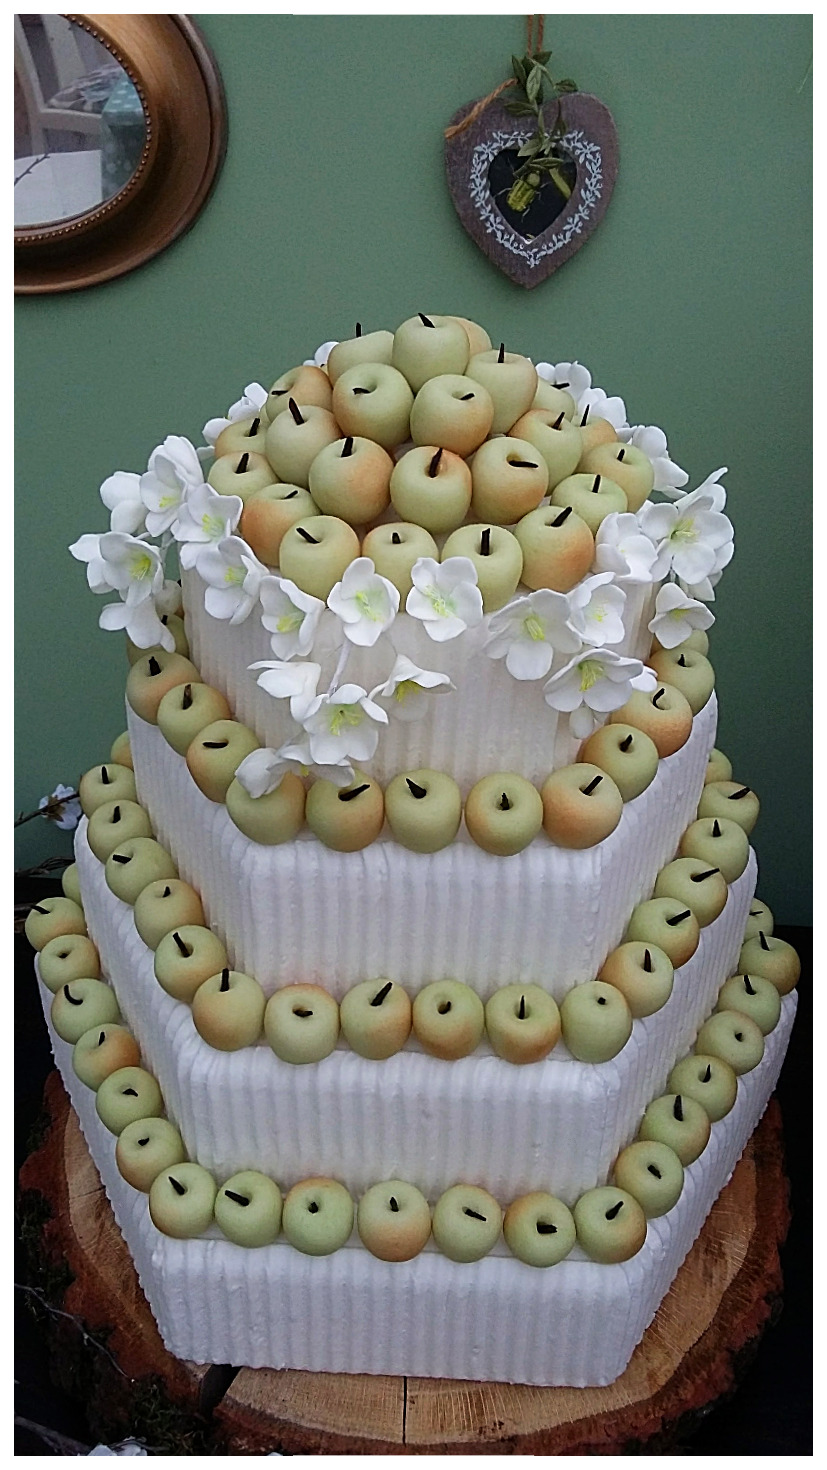 Marzipan apples hexagonal cake